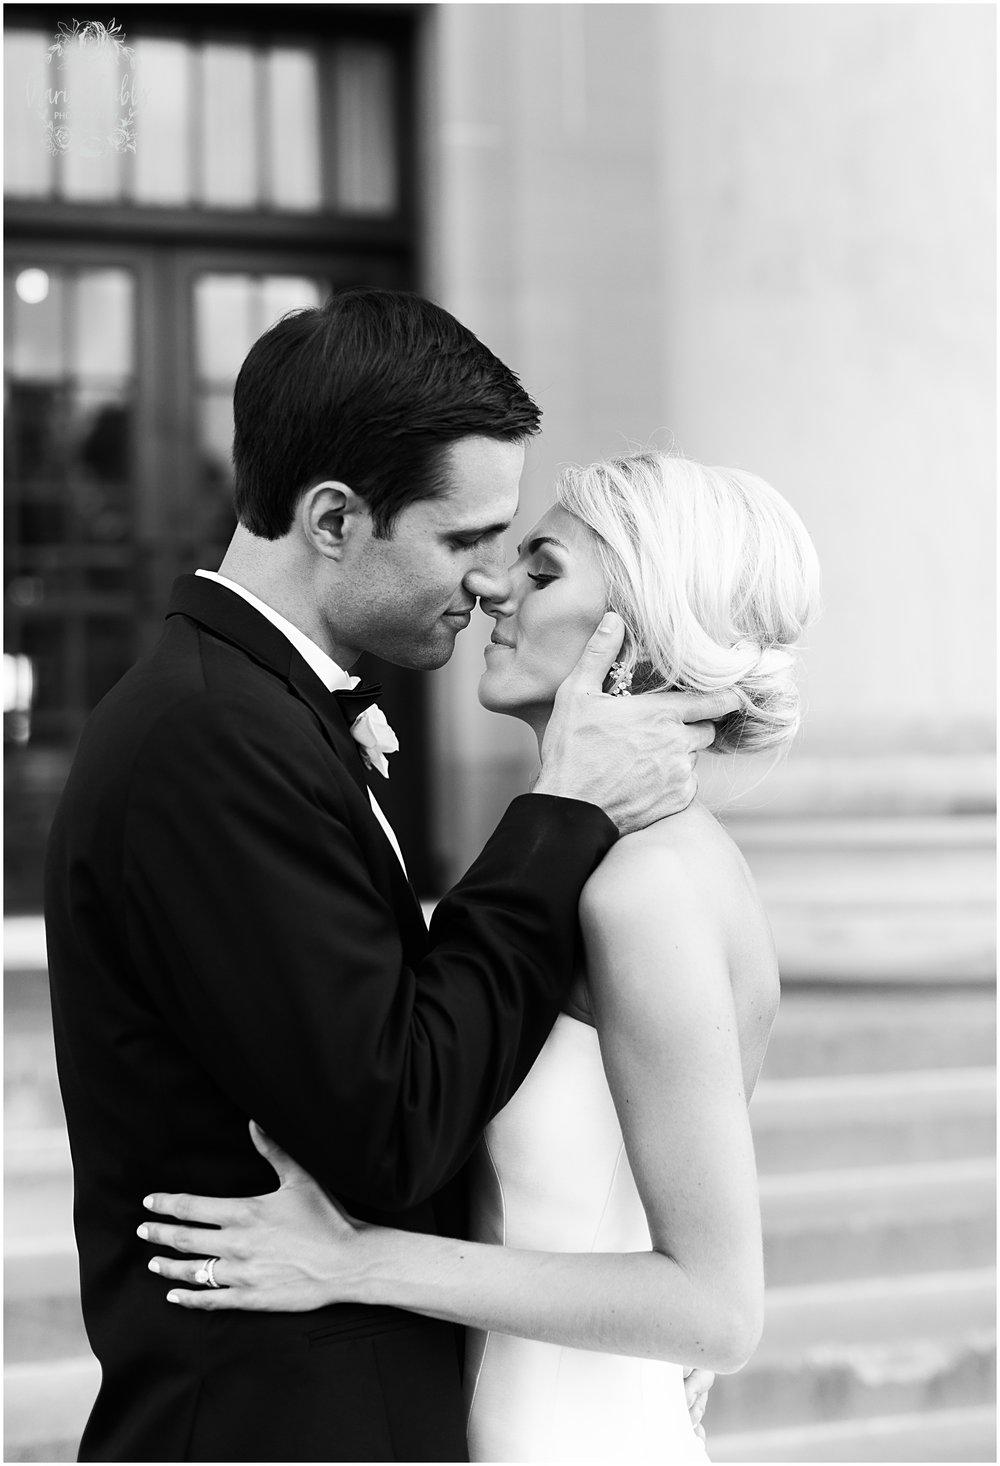 NOLL WEDDING | THE BRASS ON BALTIMORE | MARISSA CRIBBS PHOTOGRAPHY_6339.jpg